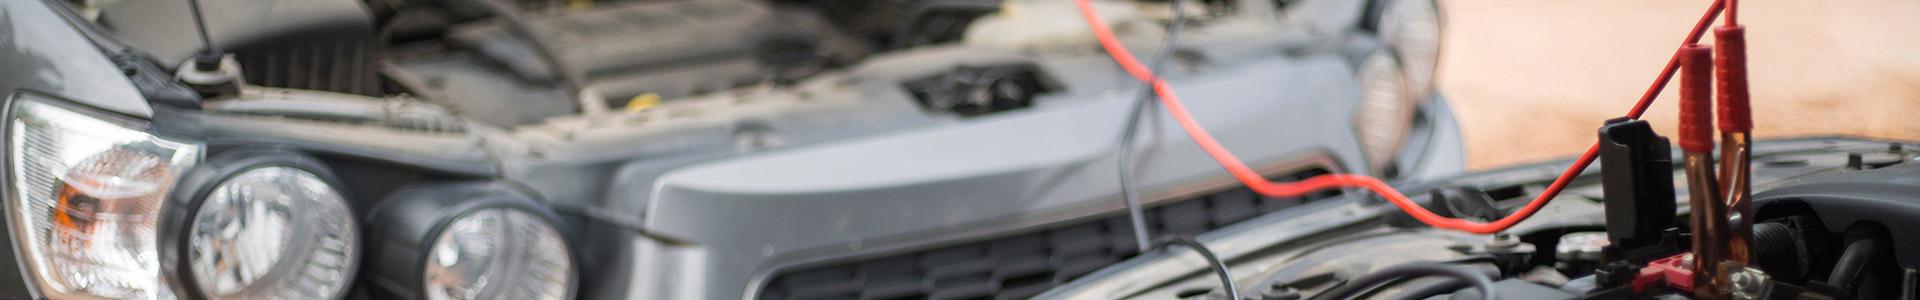 How do I know my starter motor is faulty? | AutoGuru